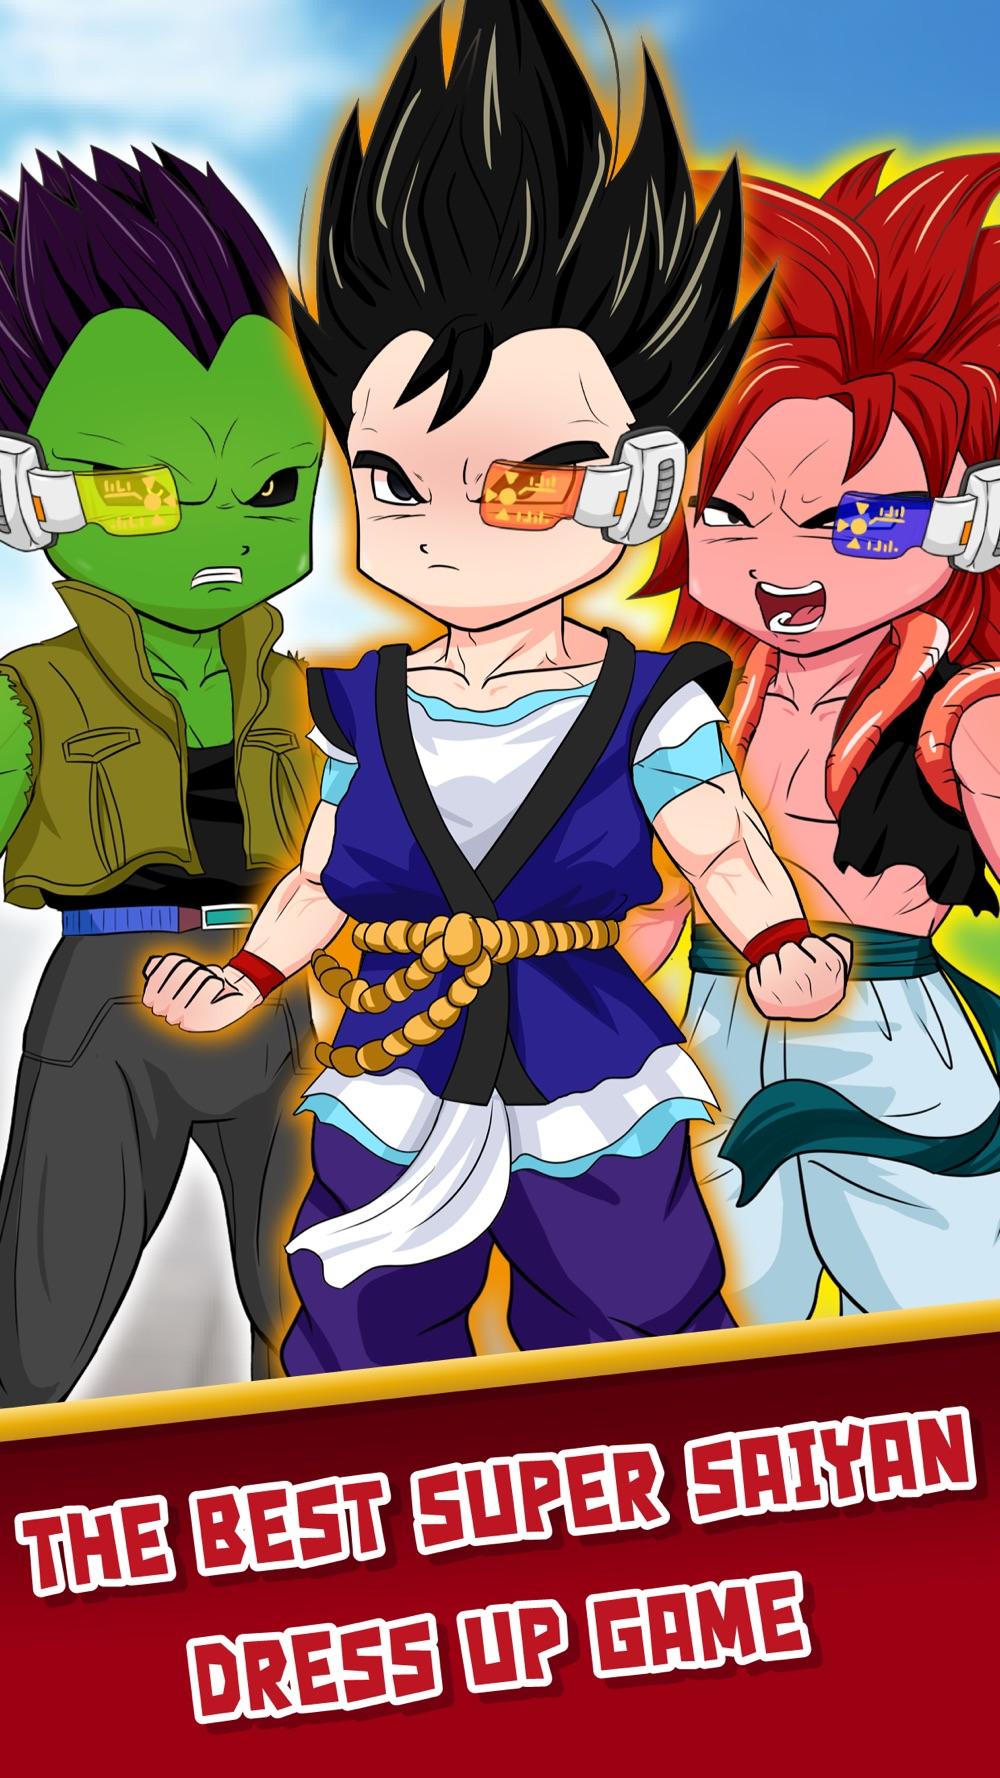 DBZ Goku Royale Dress Up  – Create Your Own Clash Super Saiyan Dragon Ball Z Edition